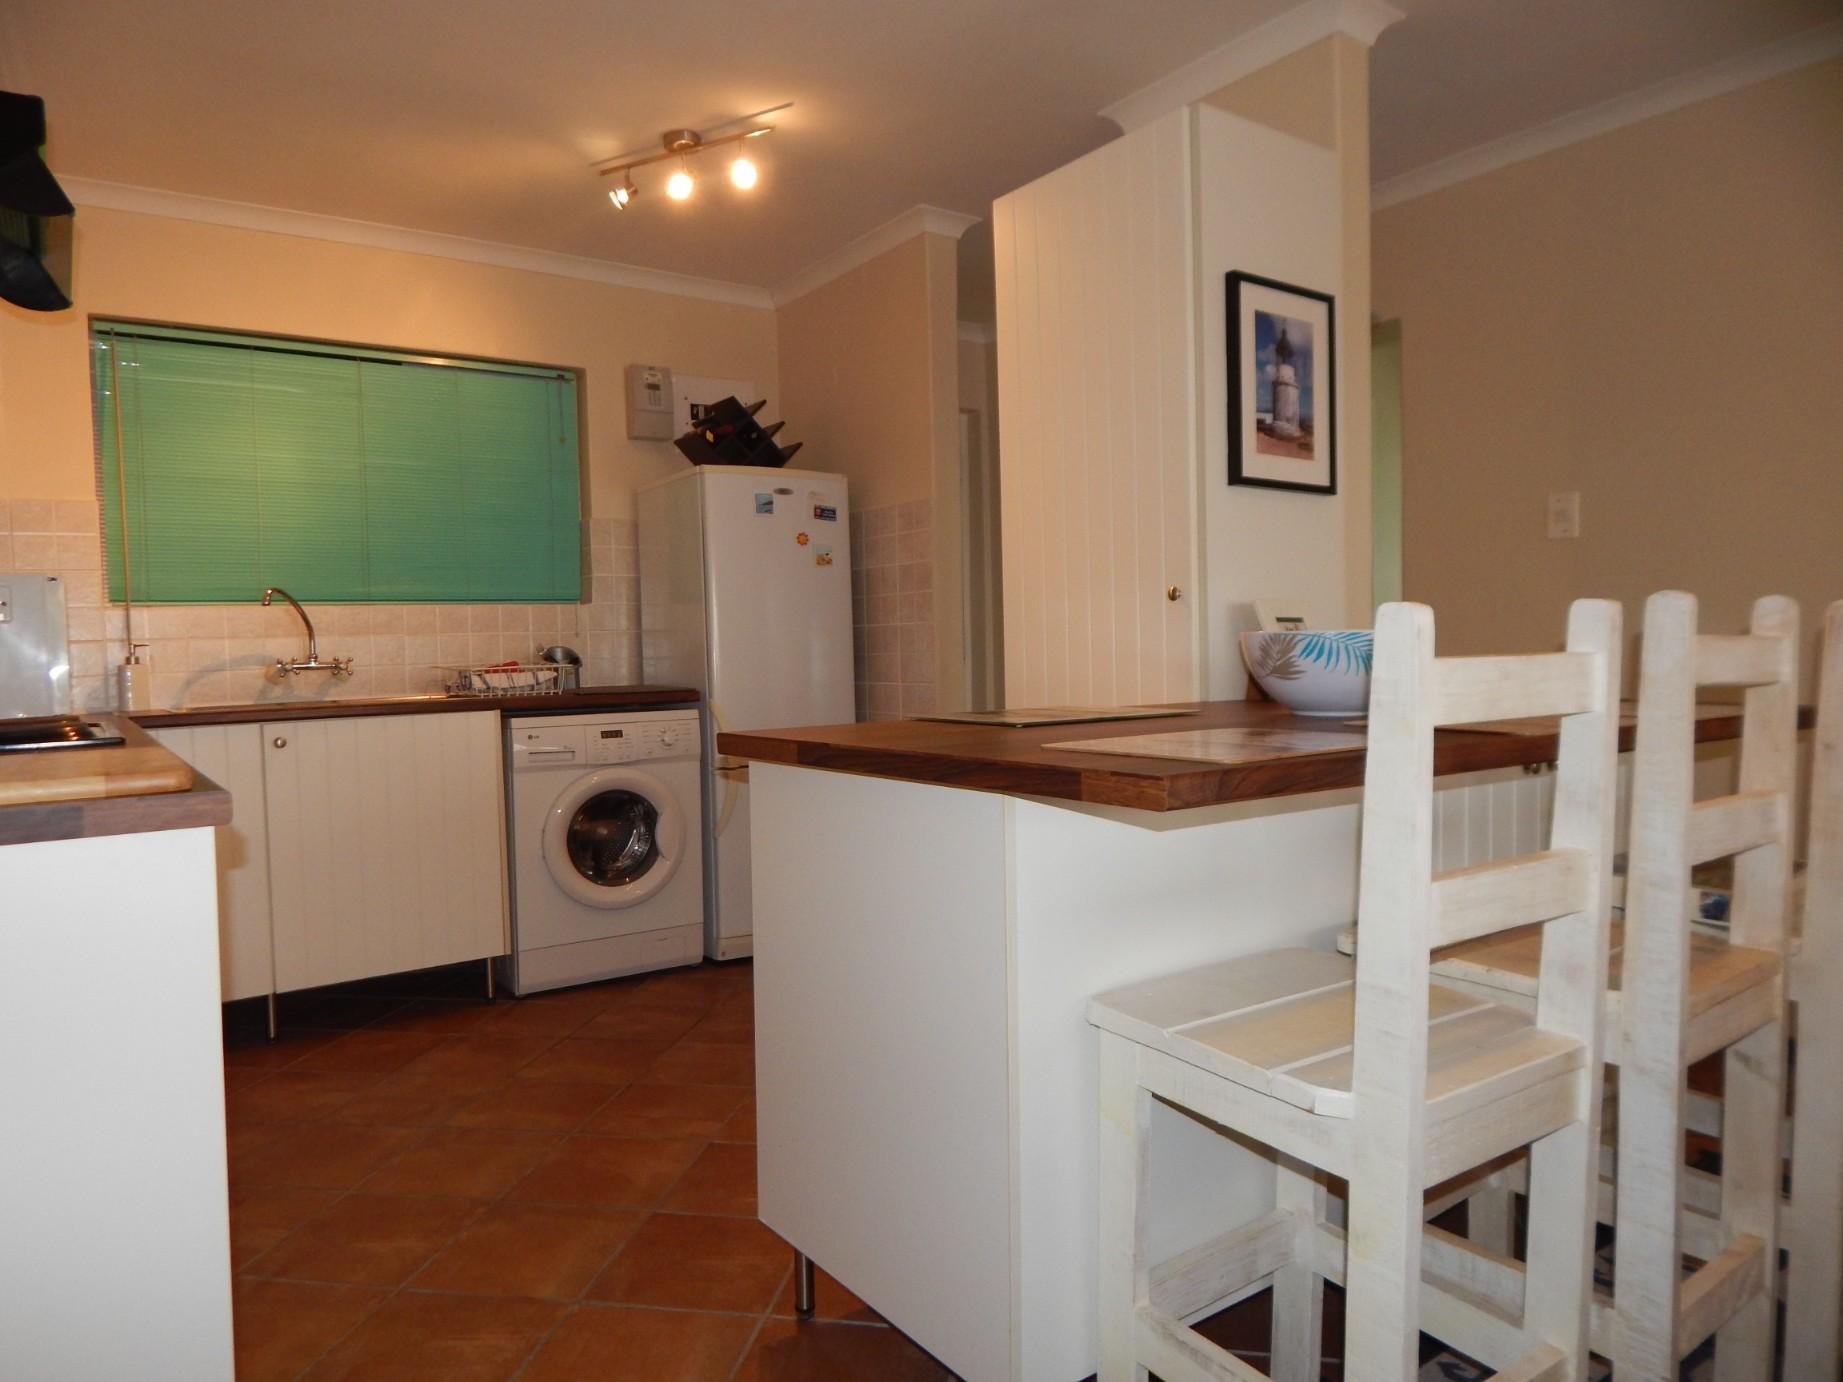 3 Bedroom Apartment for sale in De Bakke ENT0066483 : photo#7